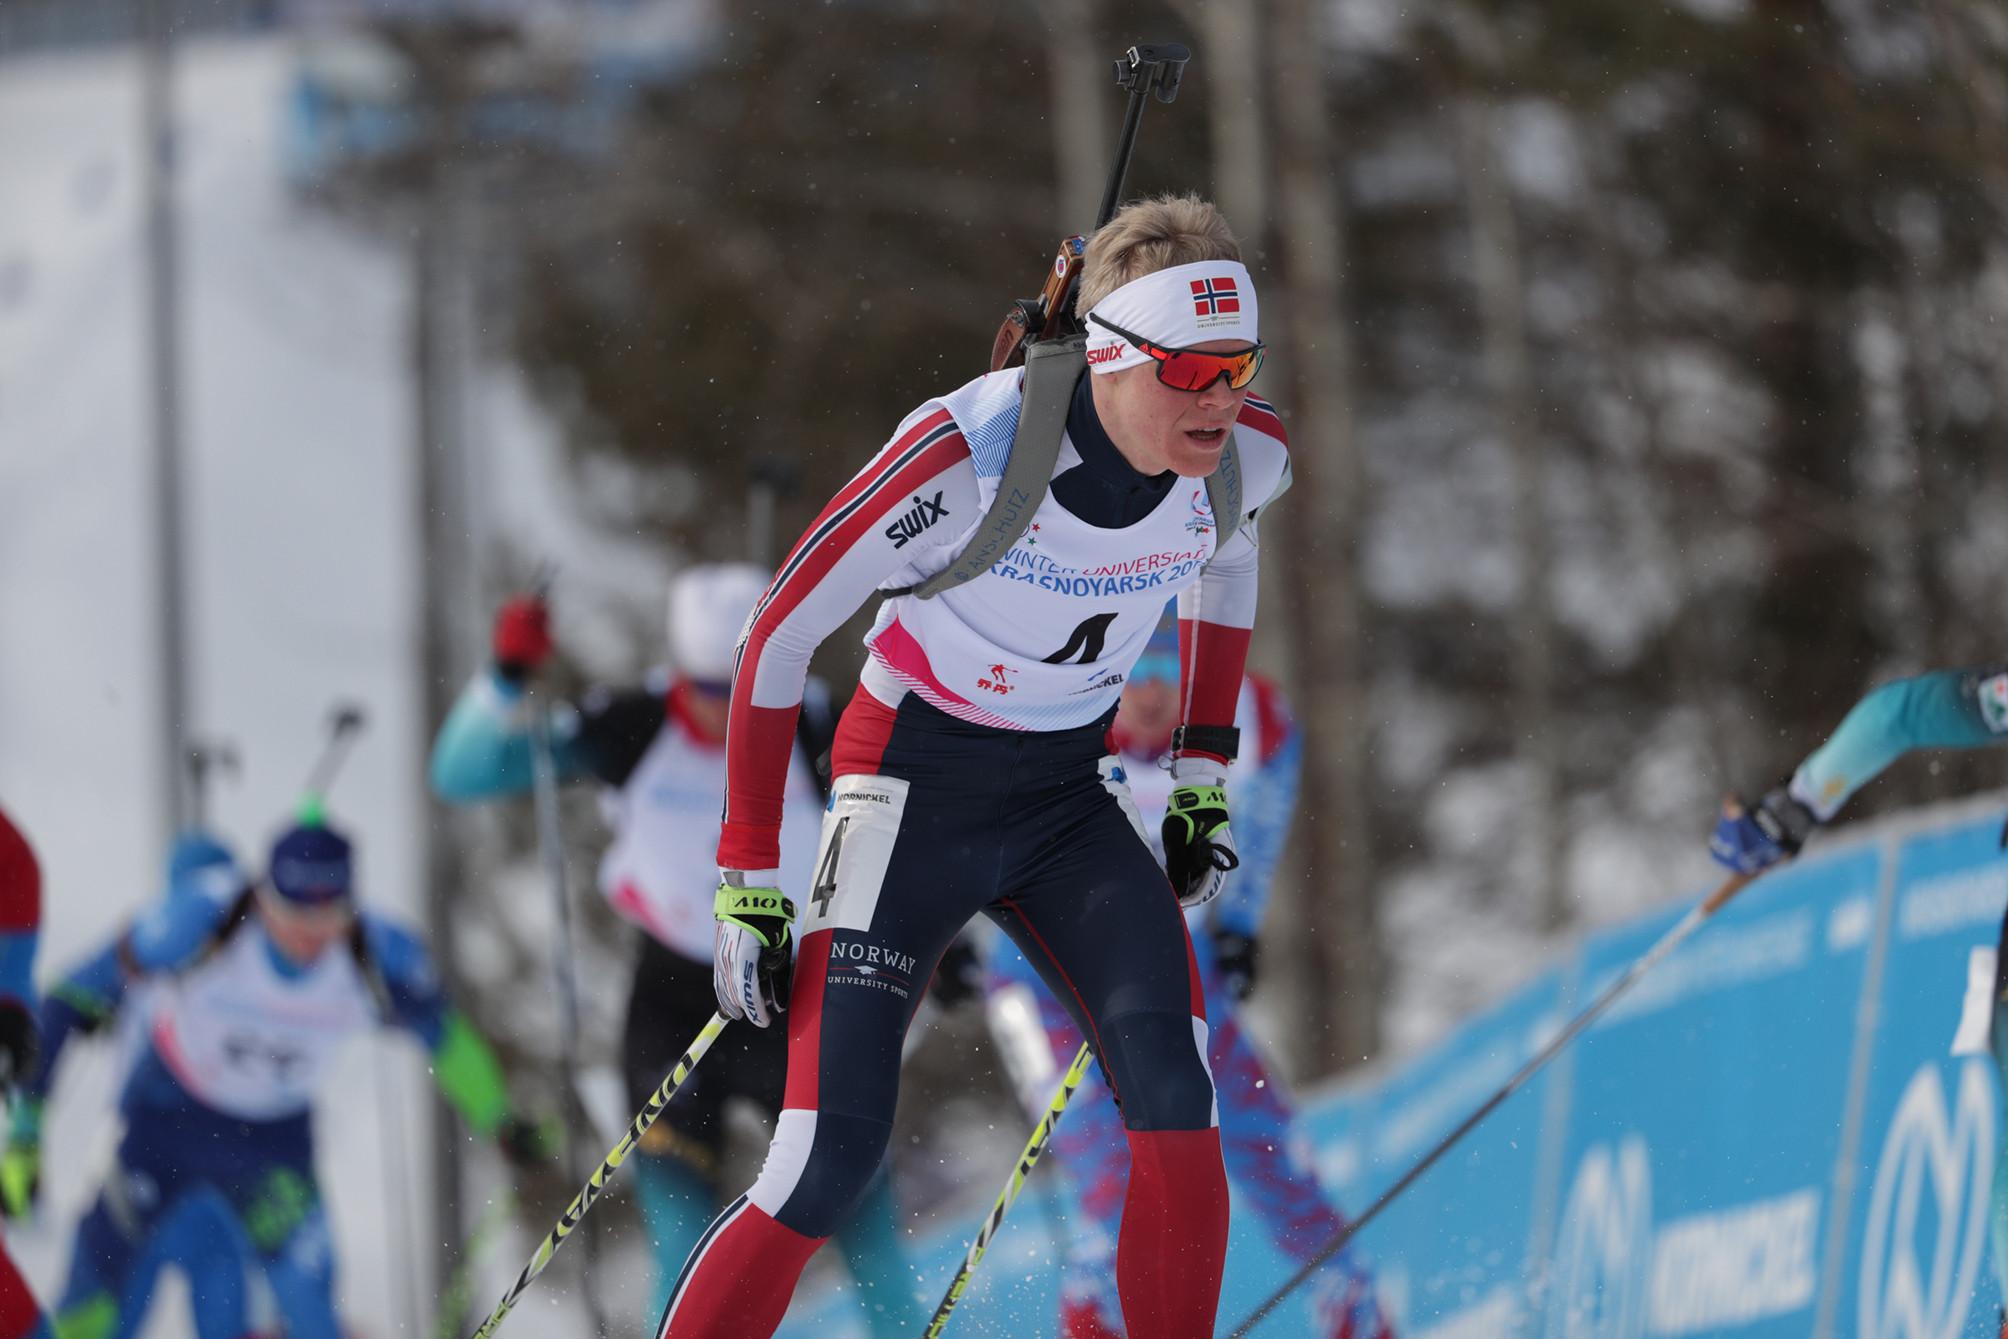 Norwegian wins mass start to prevent Russian gold in every biathlon event at Krasnoyarsk 2019